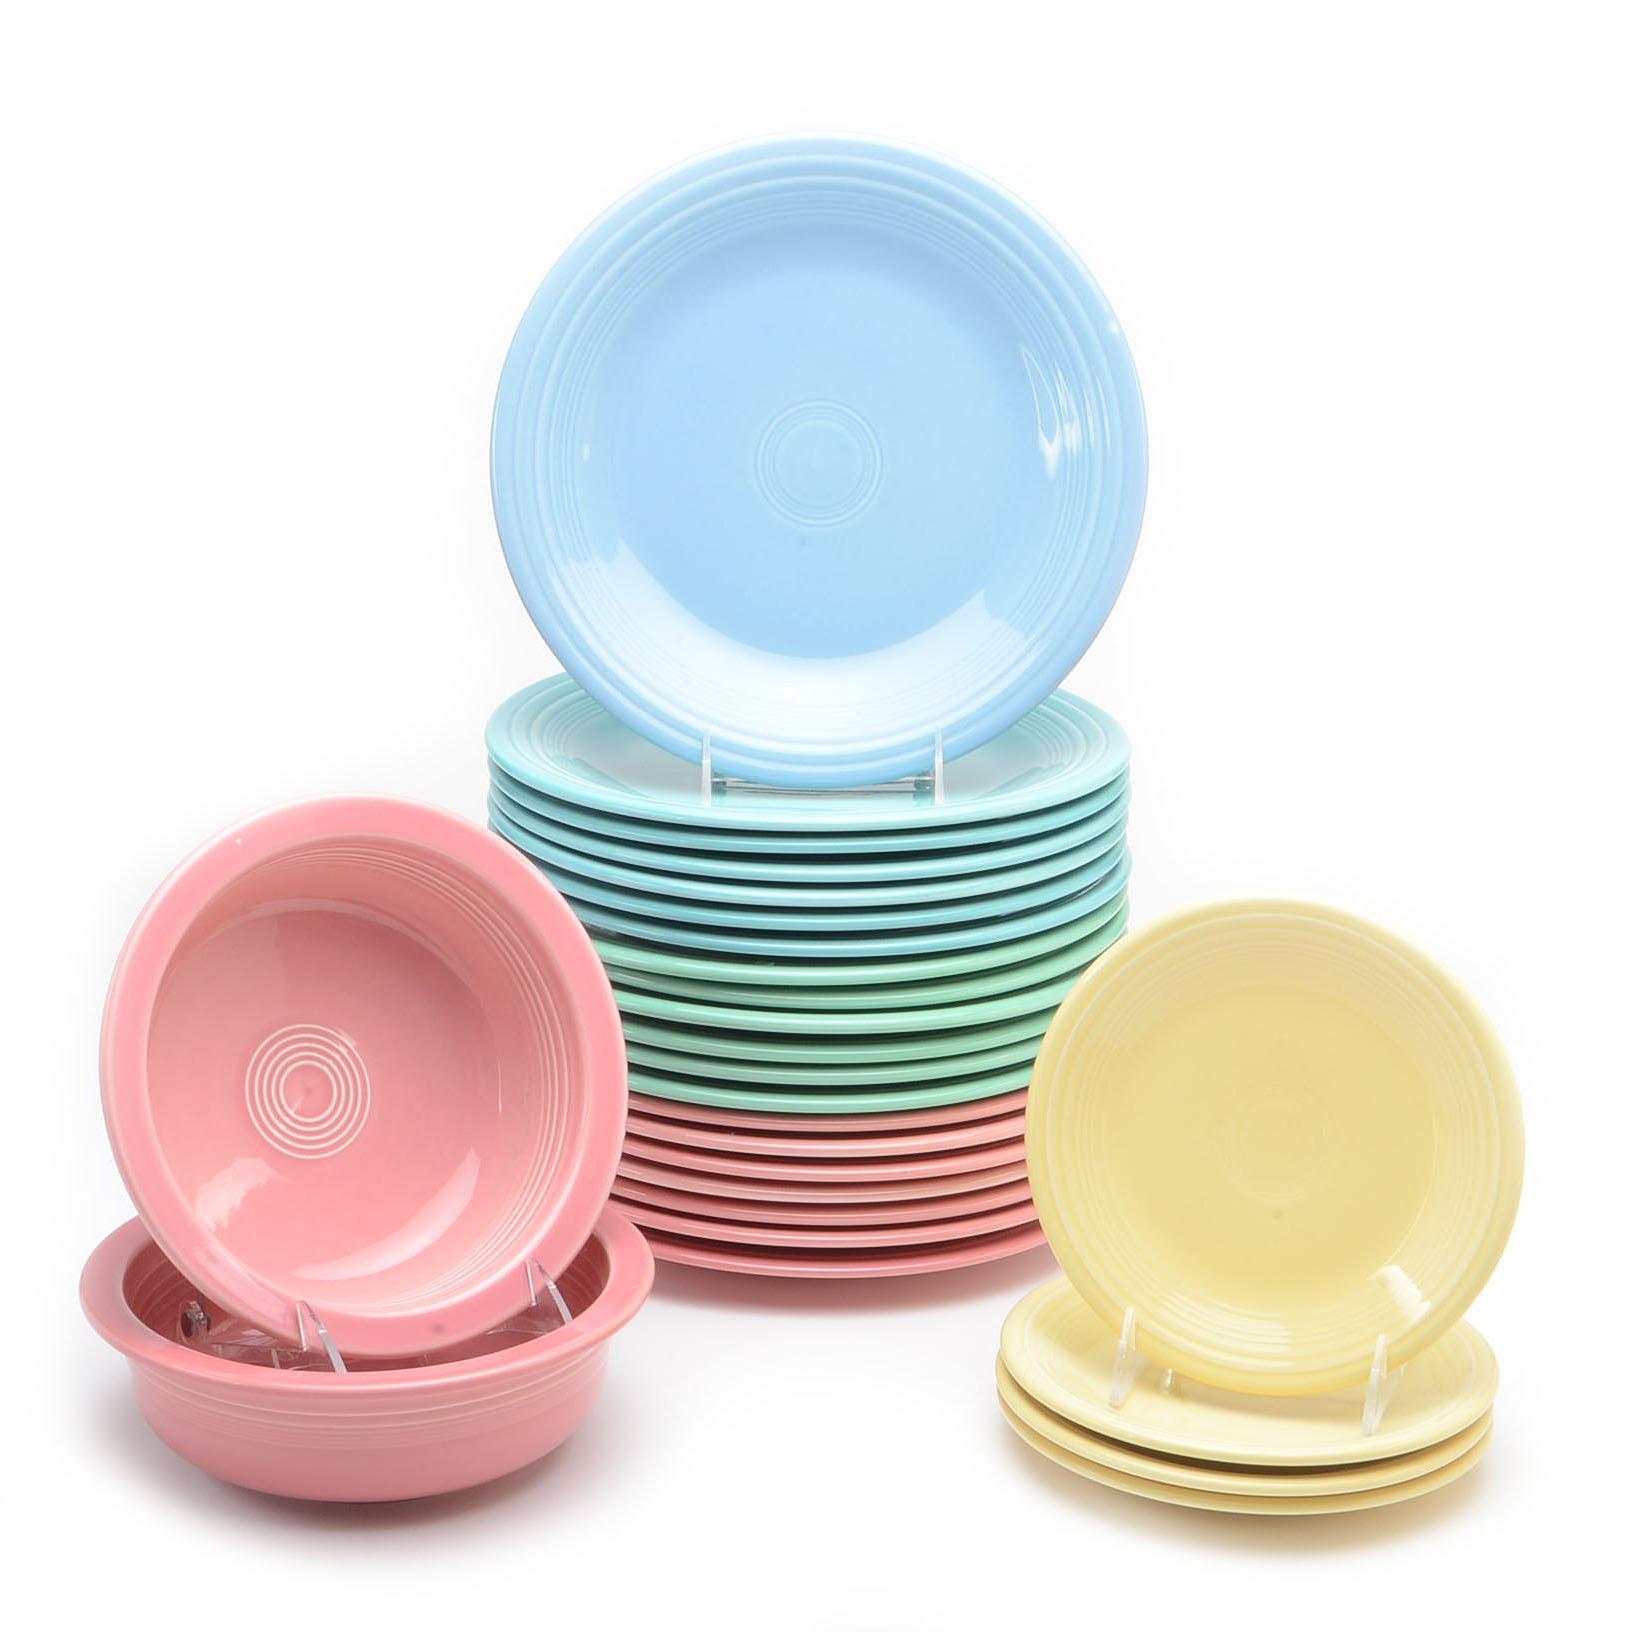 Twenty-Six Piece Collection of Fiestaware